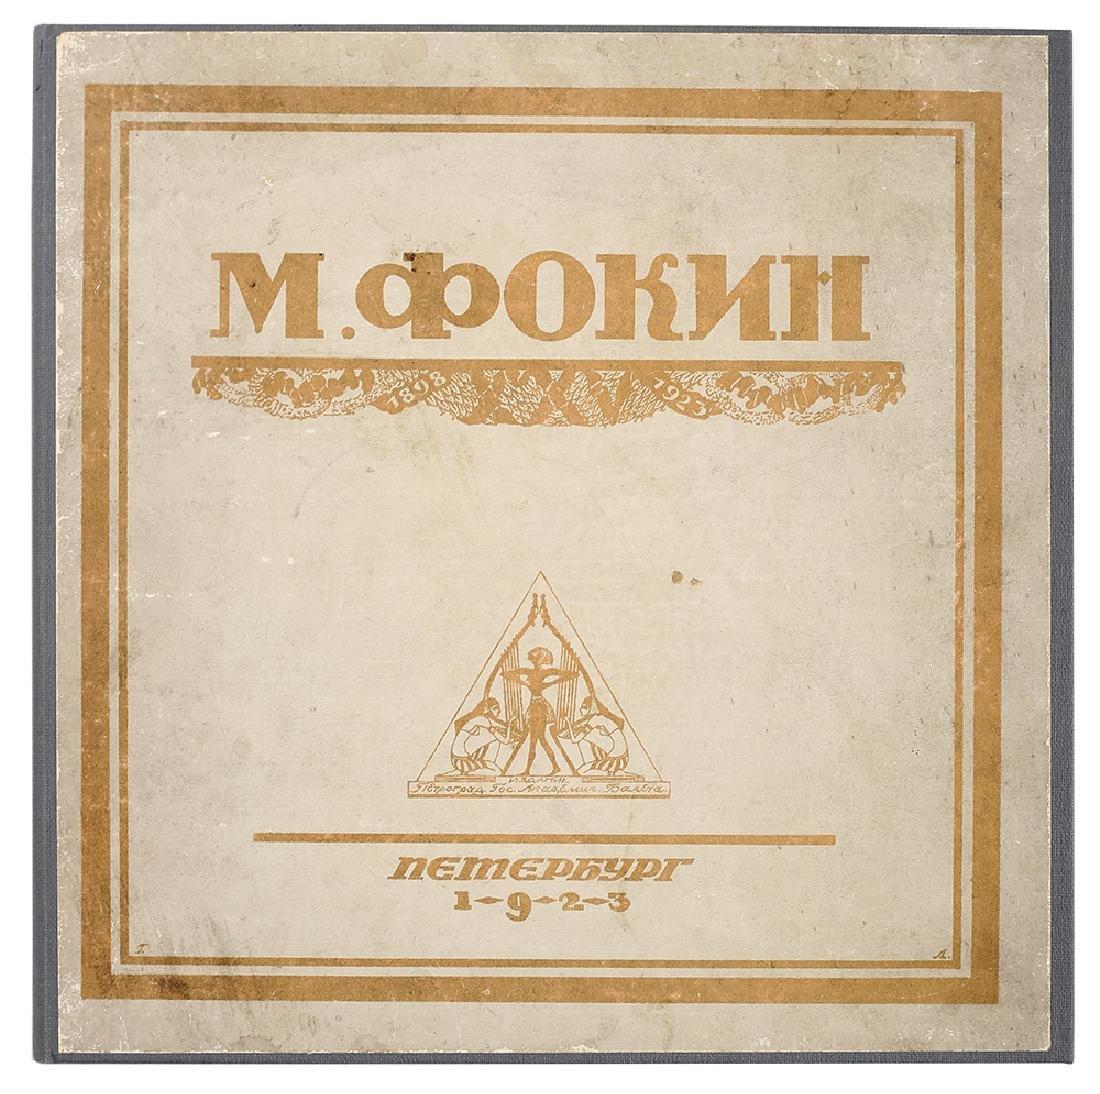 Ivanov, I.N. M. Fokin. St. Petersburg, 1923.